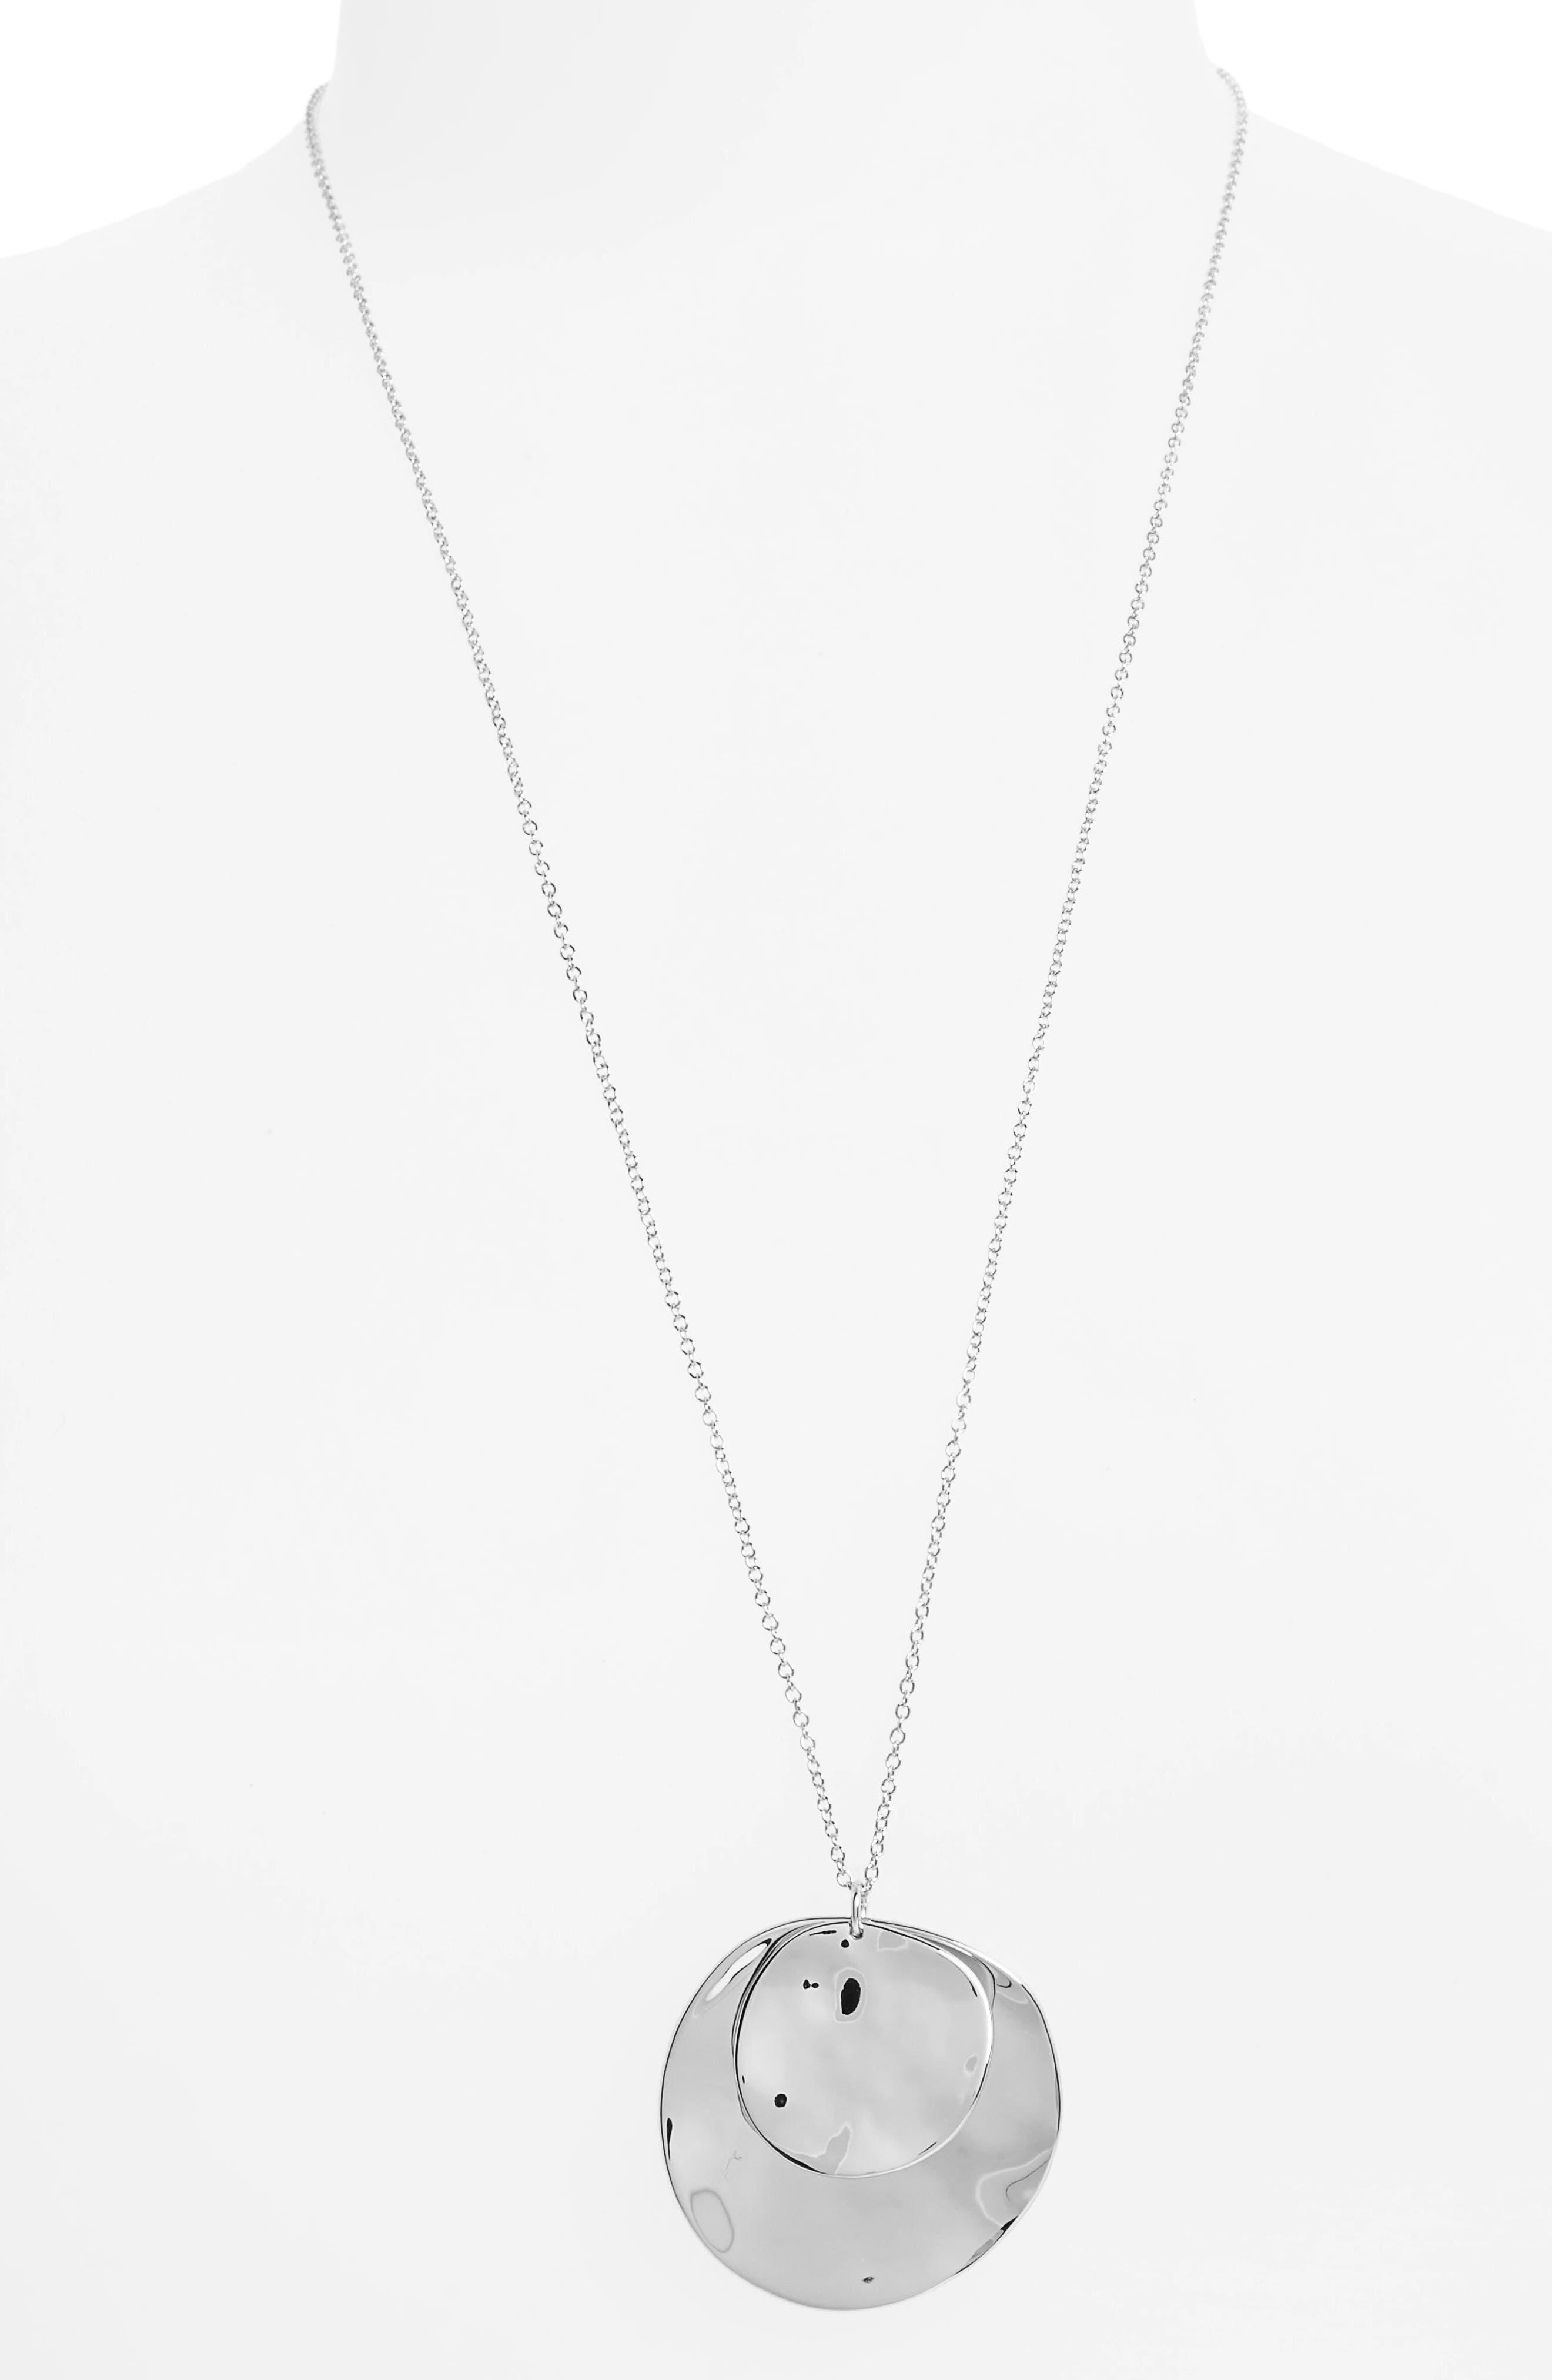 Chloe Long Cluster Pendant Necklace,                         Main,                         color, Silver